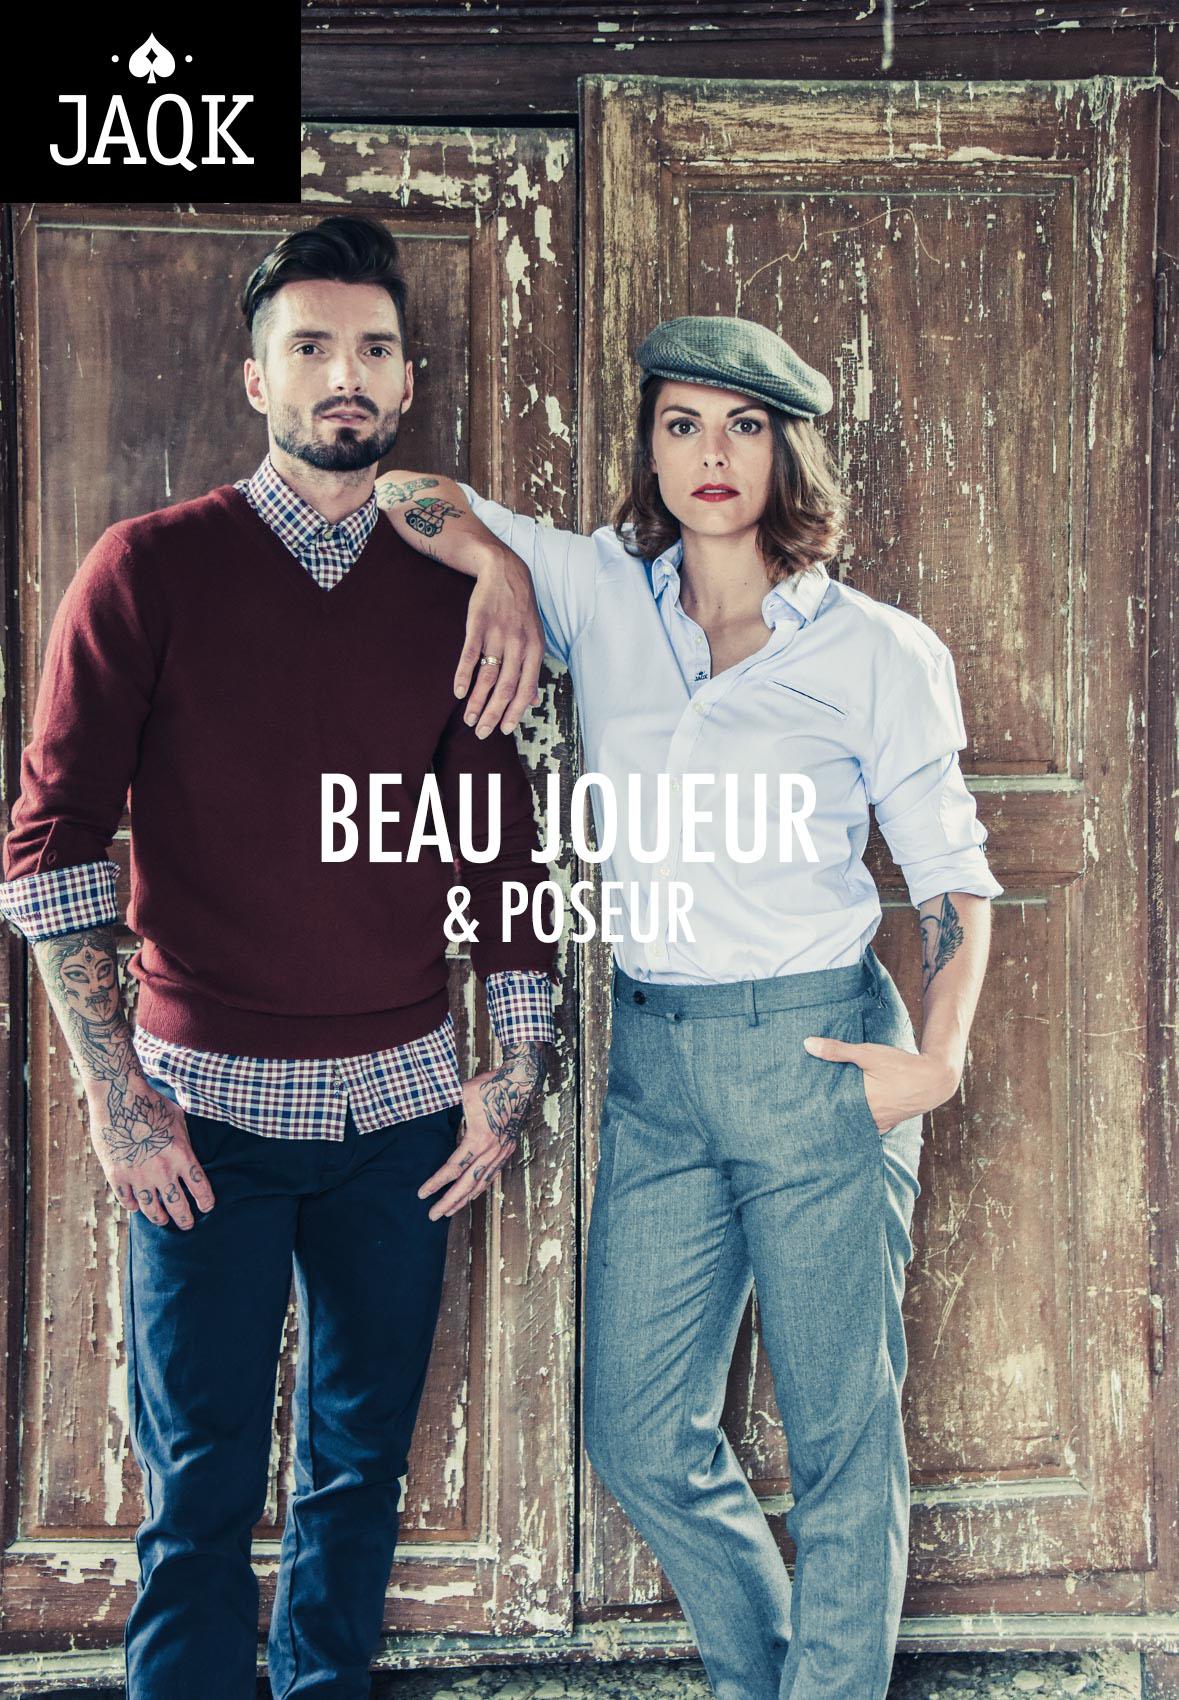 pub-jaqk-hiver-2018-web-selection-87